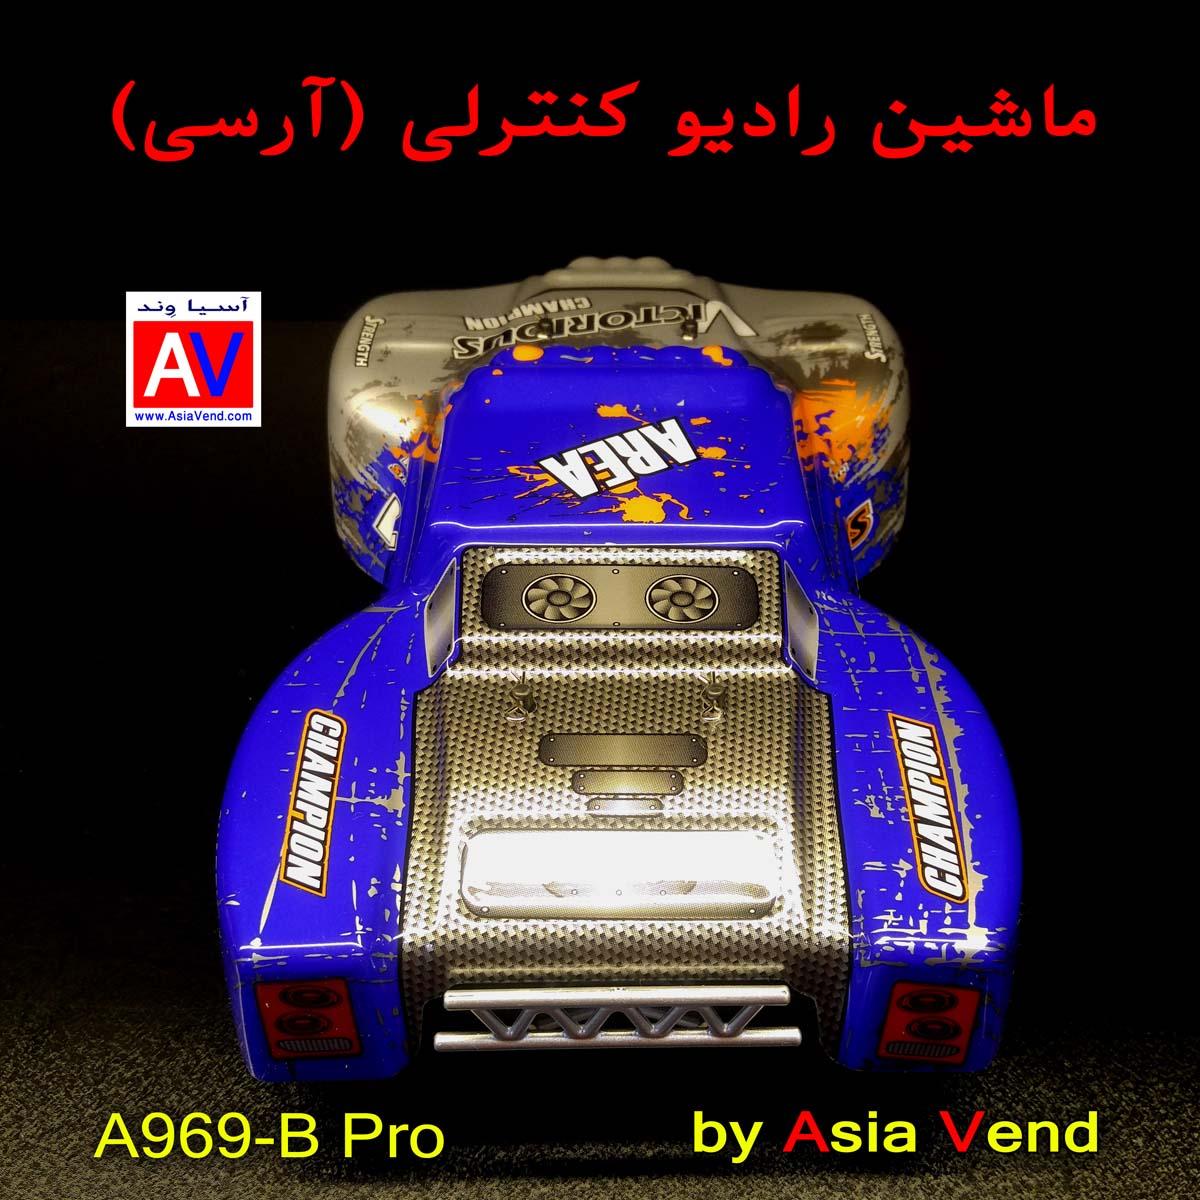 ماشین کنترلی 1 ماشین کنترلی حرفه ای آرسی Wltoys A969B Rc Car